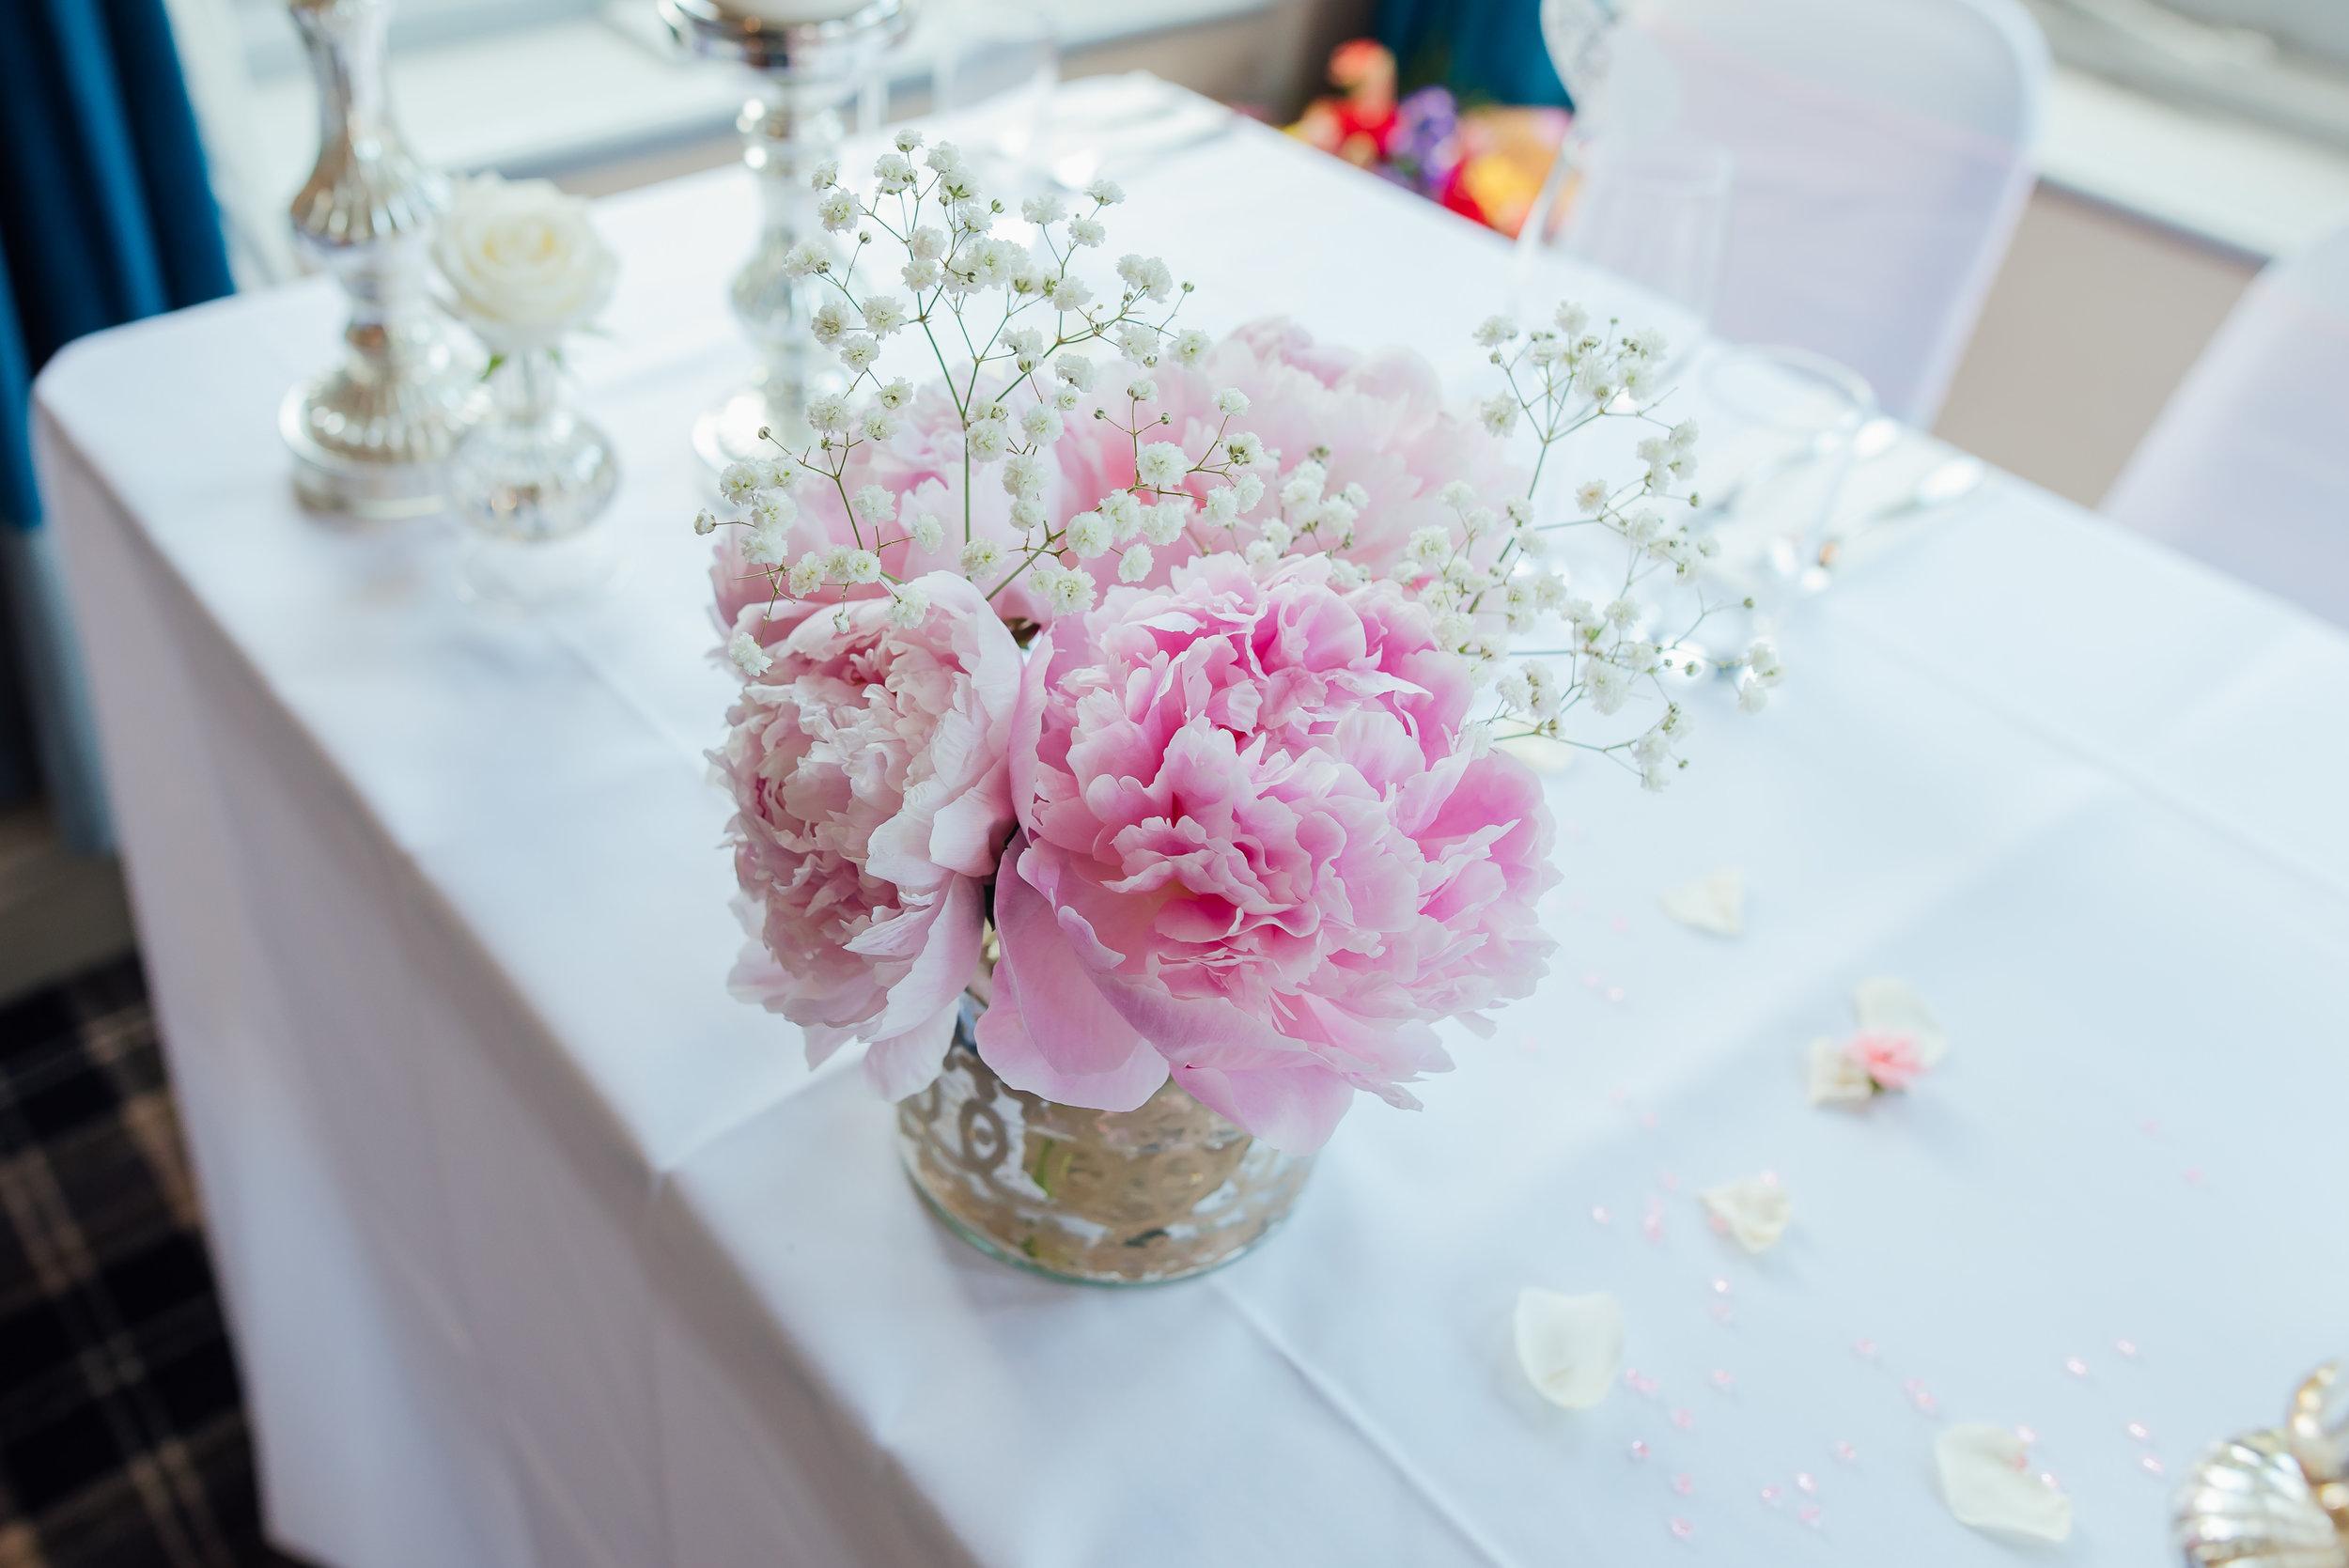 Hampshire-wedding-photographer : Amy-james-photography : Surrey-wedding-photographer : Fleet-wedding-photographer : Worplesdon-Place-Wedding : Worplesdon-place-wedding-photographer : documentary-wedding-photographer-hampshire-surrey-berkshire-592.jpg